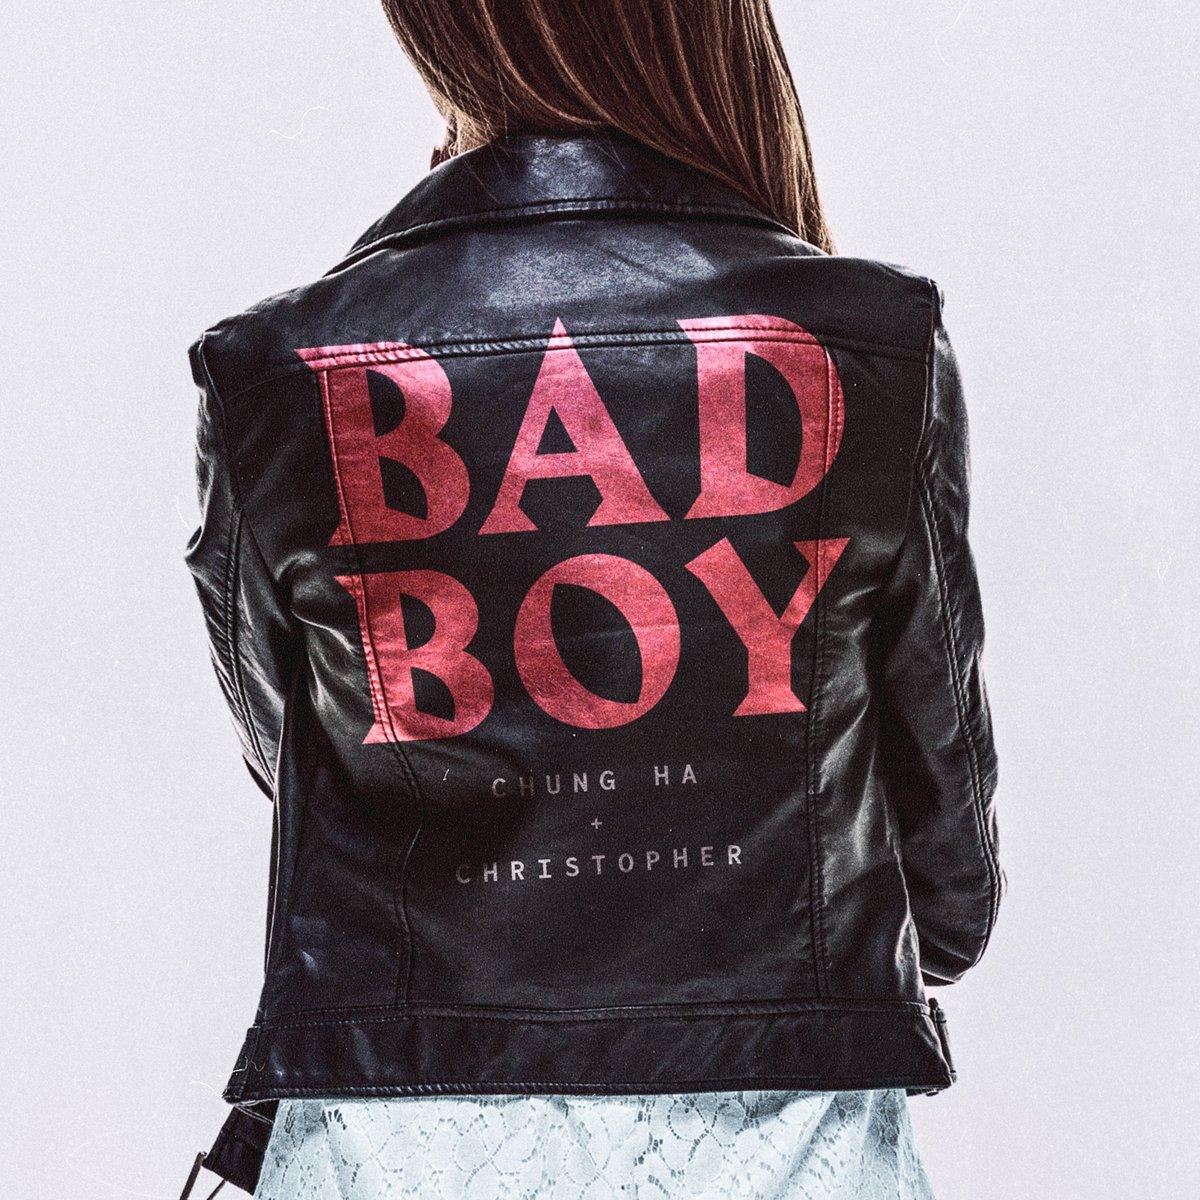 Bad Boy (Chung Ha & Christopher)